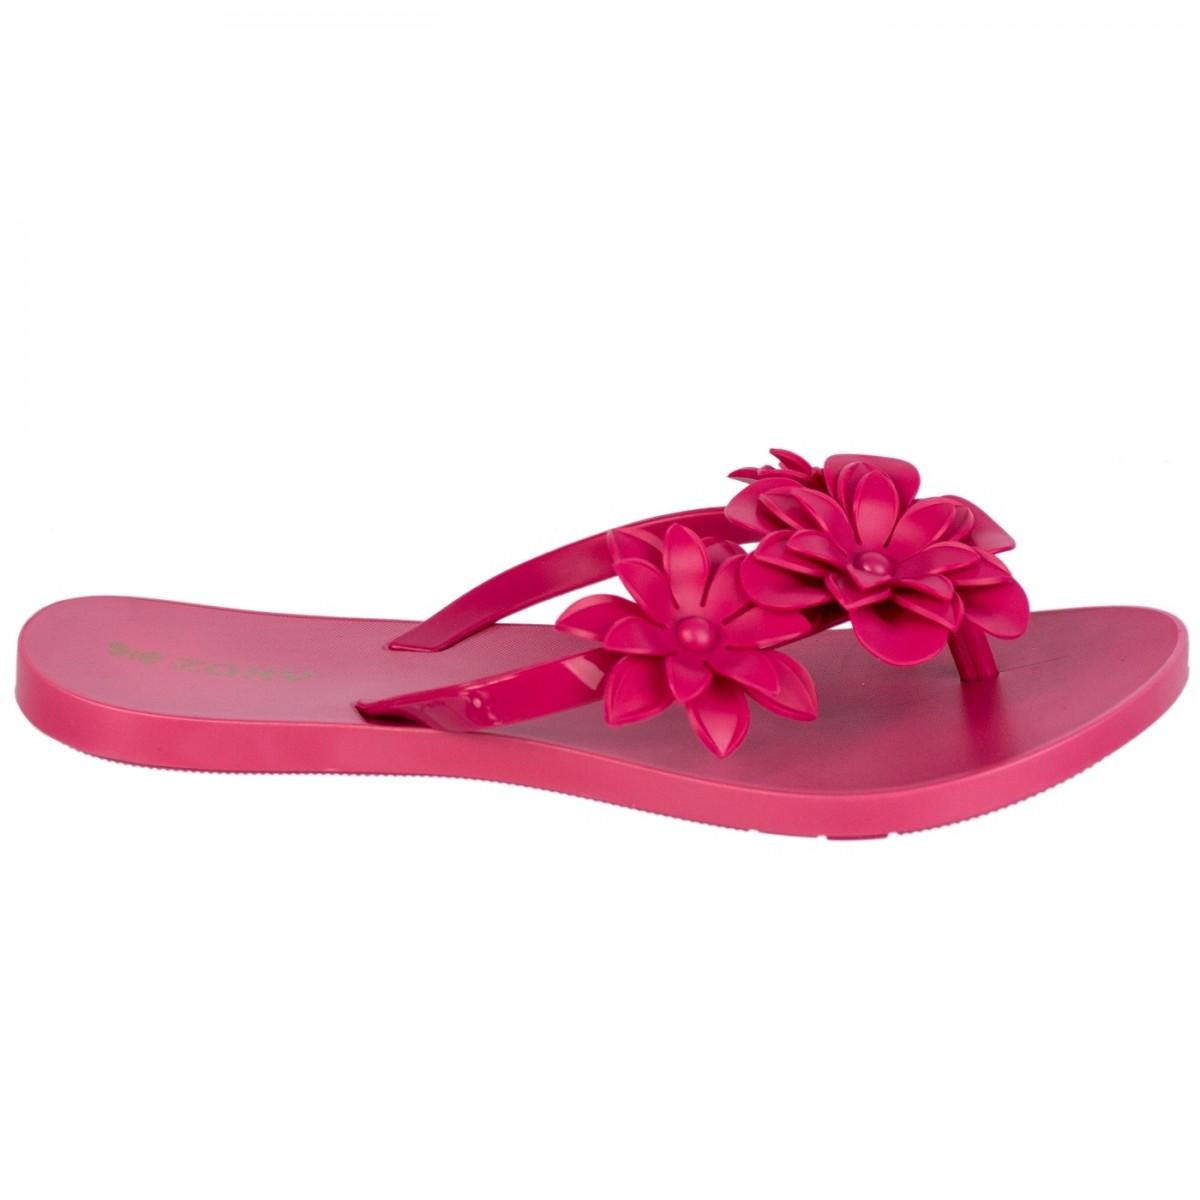 8360e579f Bizz Store - Chinelo Feminino Zaxy Grendene Fresh Preto/Rosa/Nude